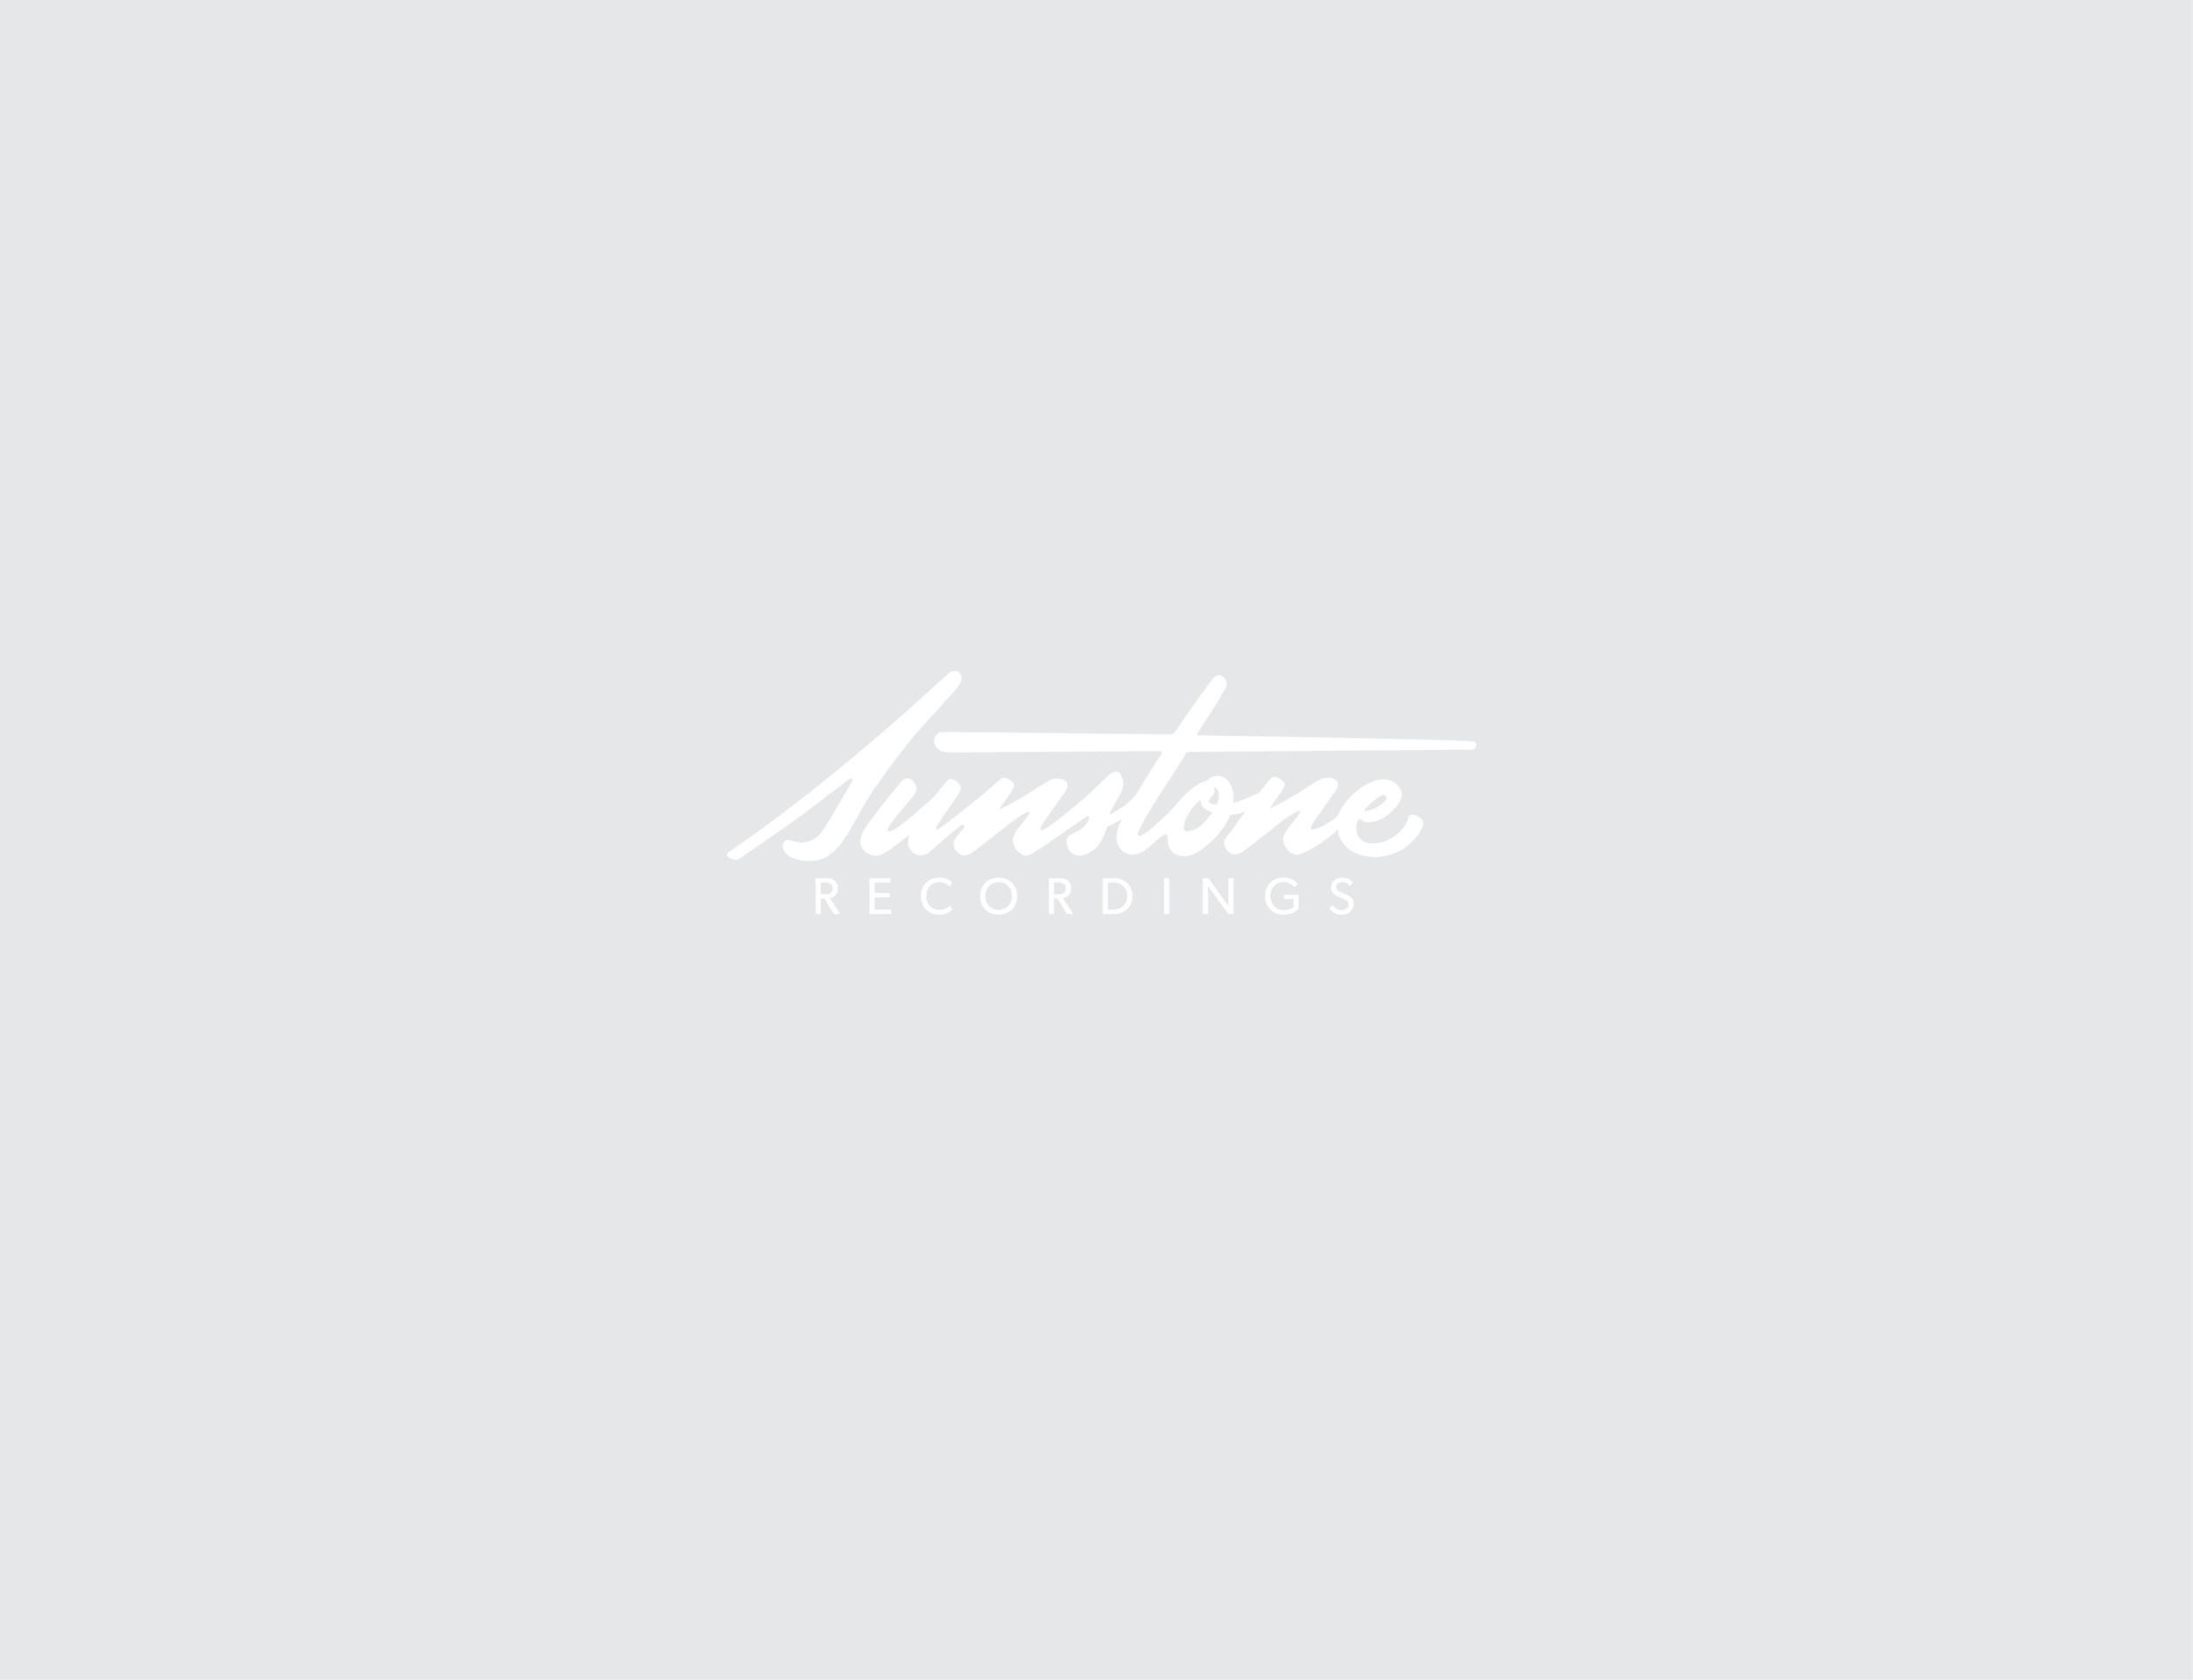 Sunstone Recordings Grey